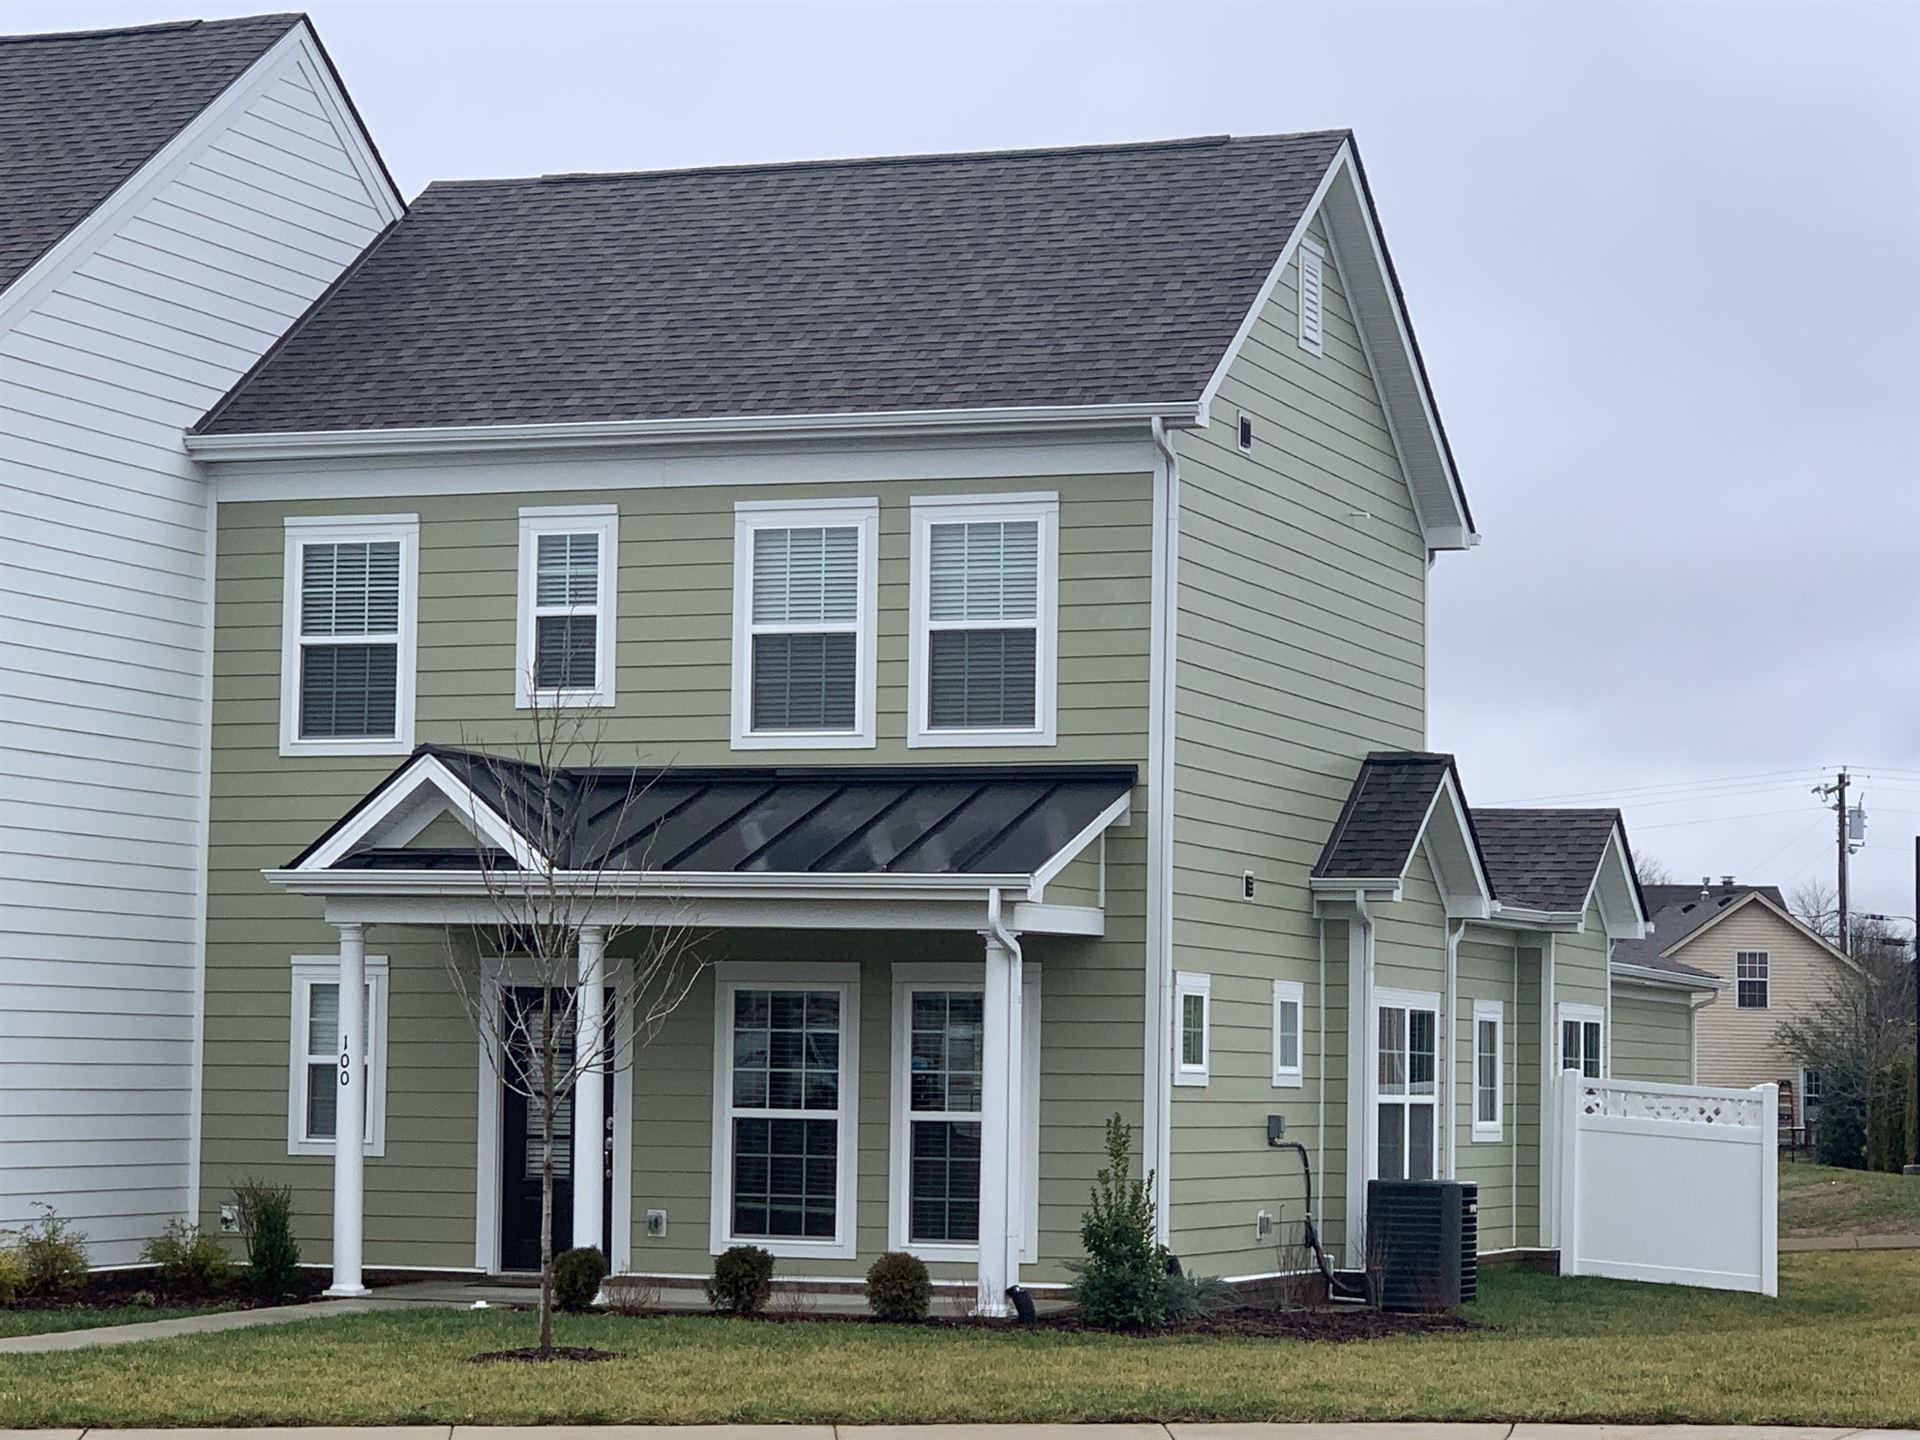 Photo of 260 Mary Ann Circle, Spring Hill, TN 37174 (MLS # 2122171)